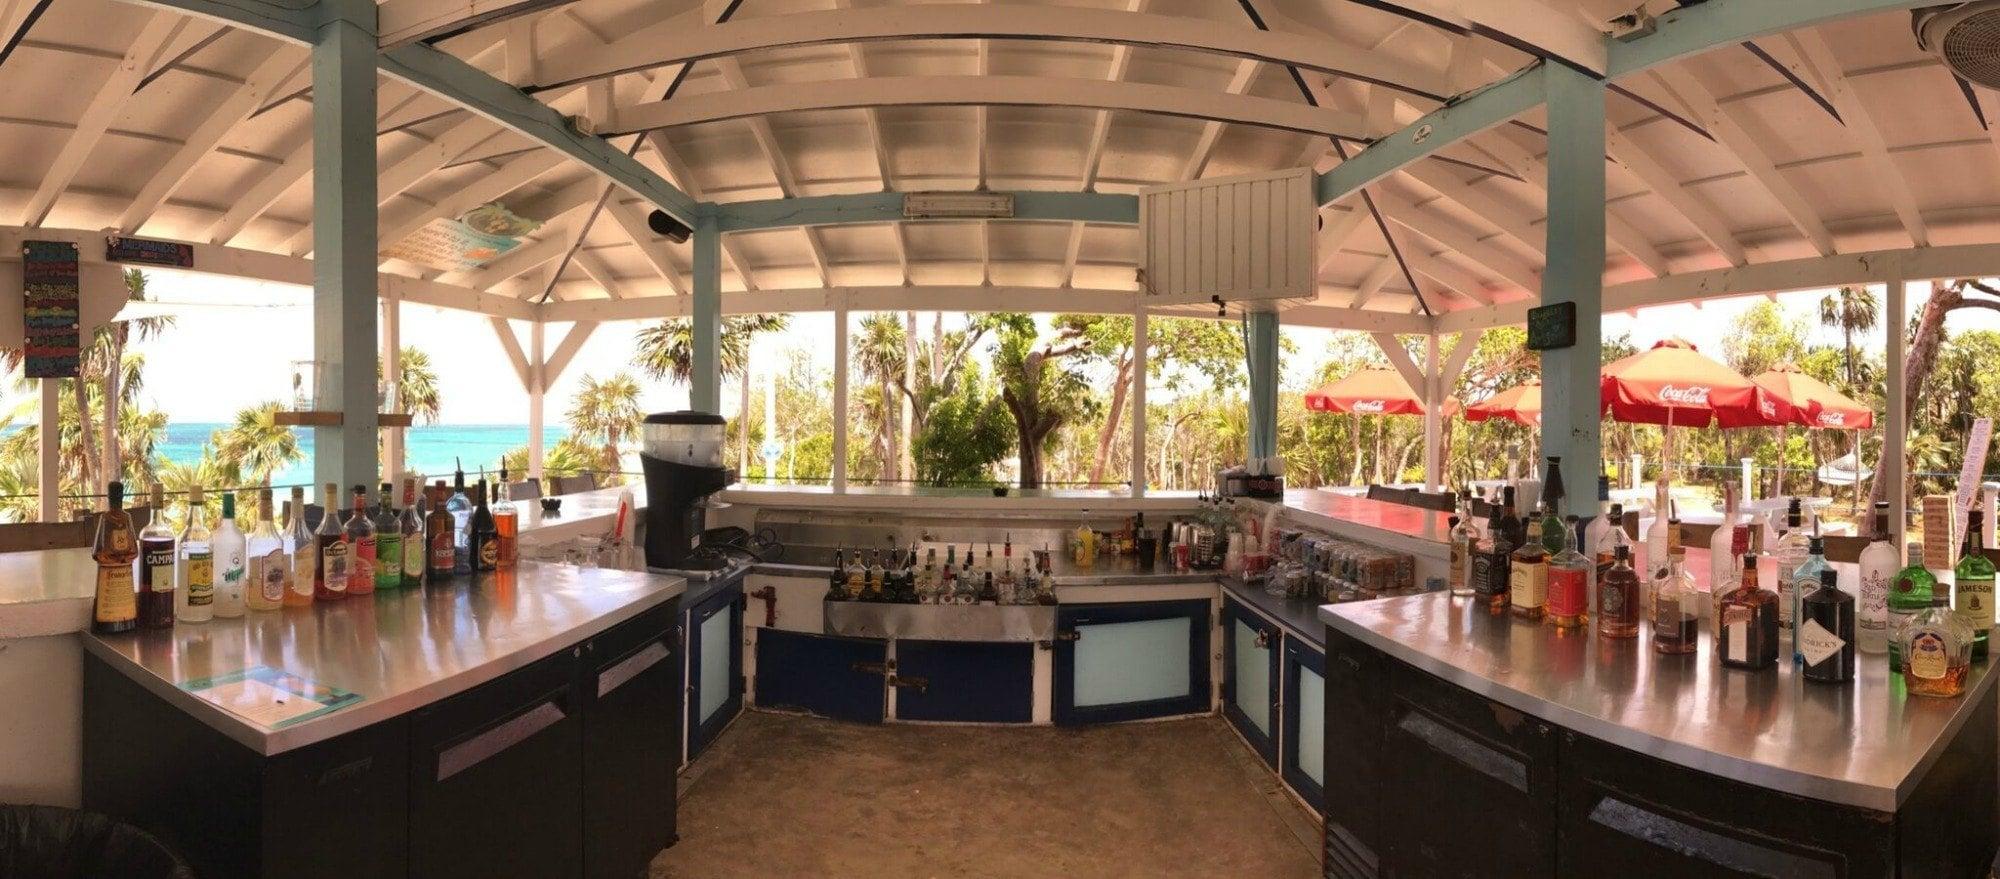 Bachelorette party bar at Sandy Toes Bahamas